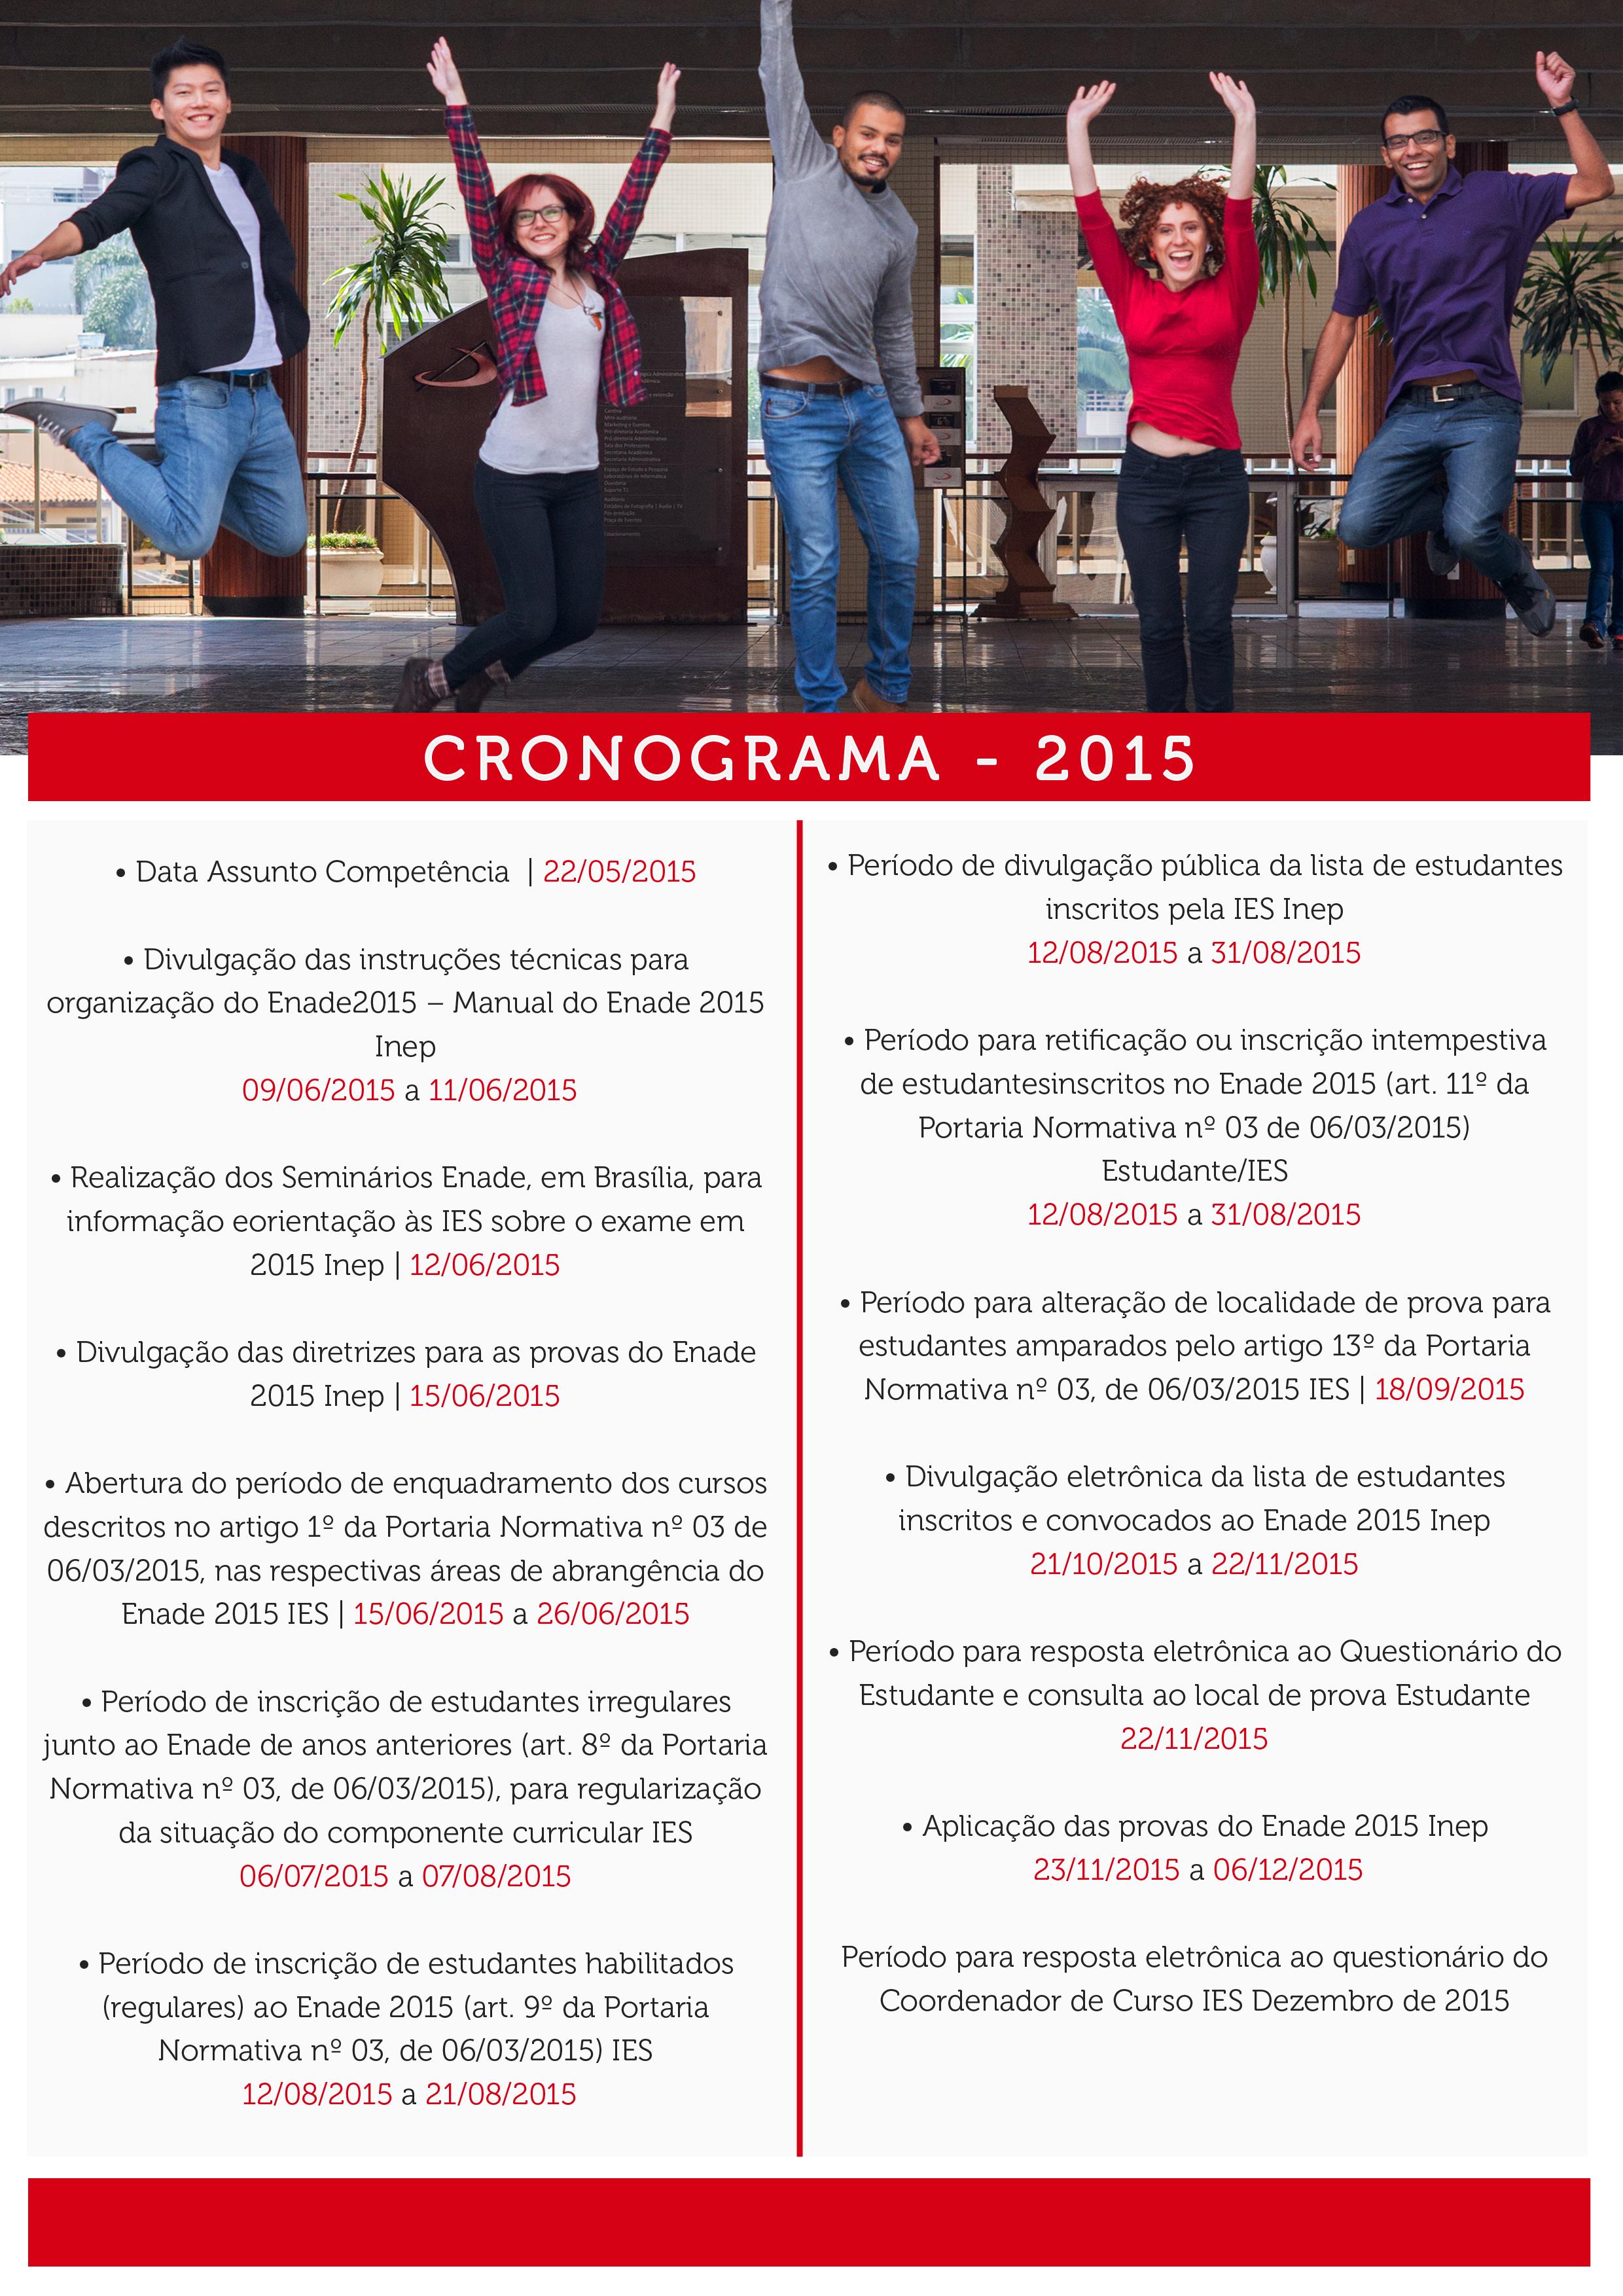 Cronograma2015